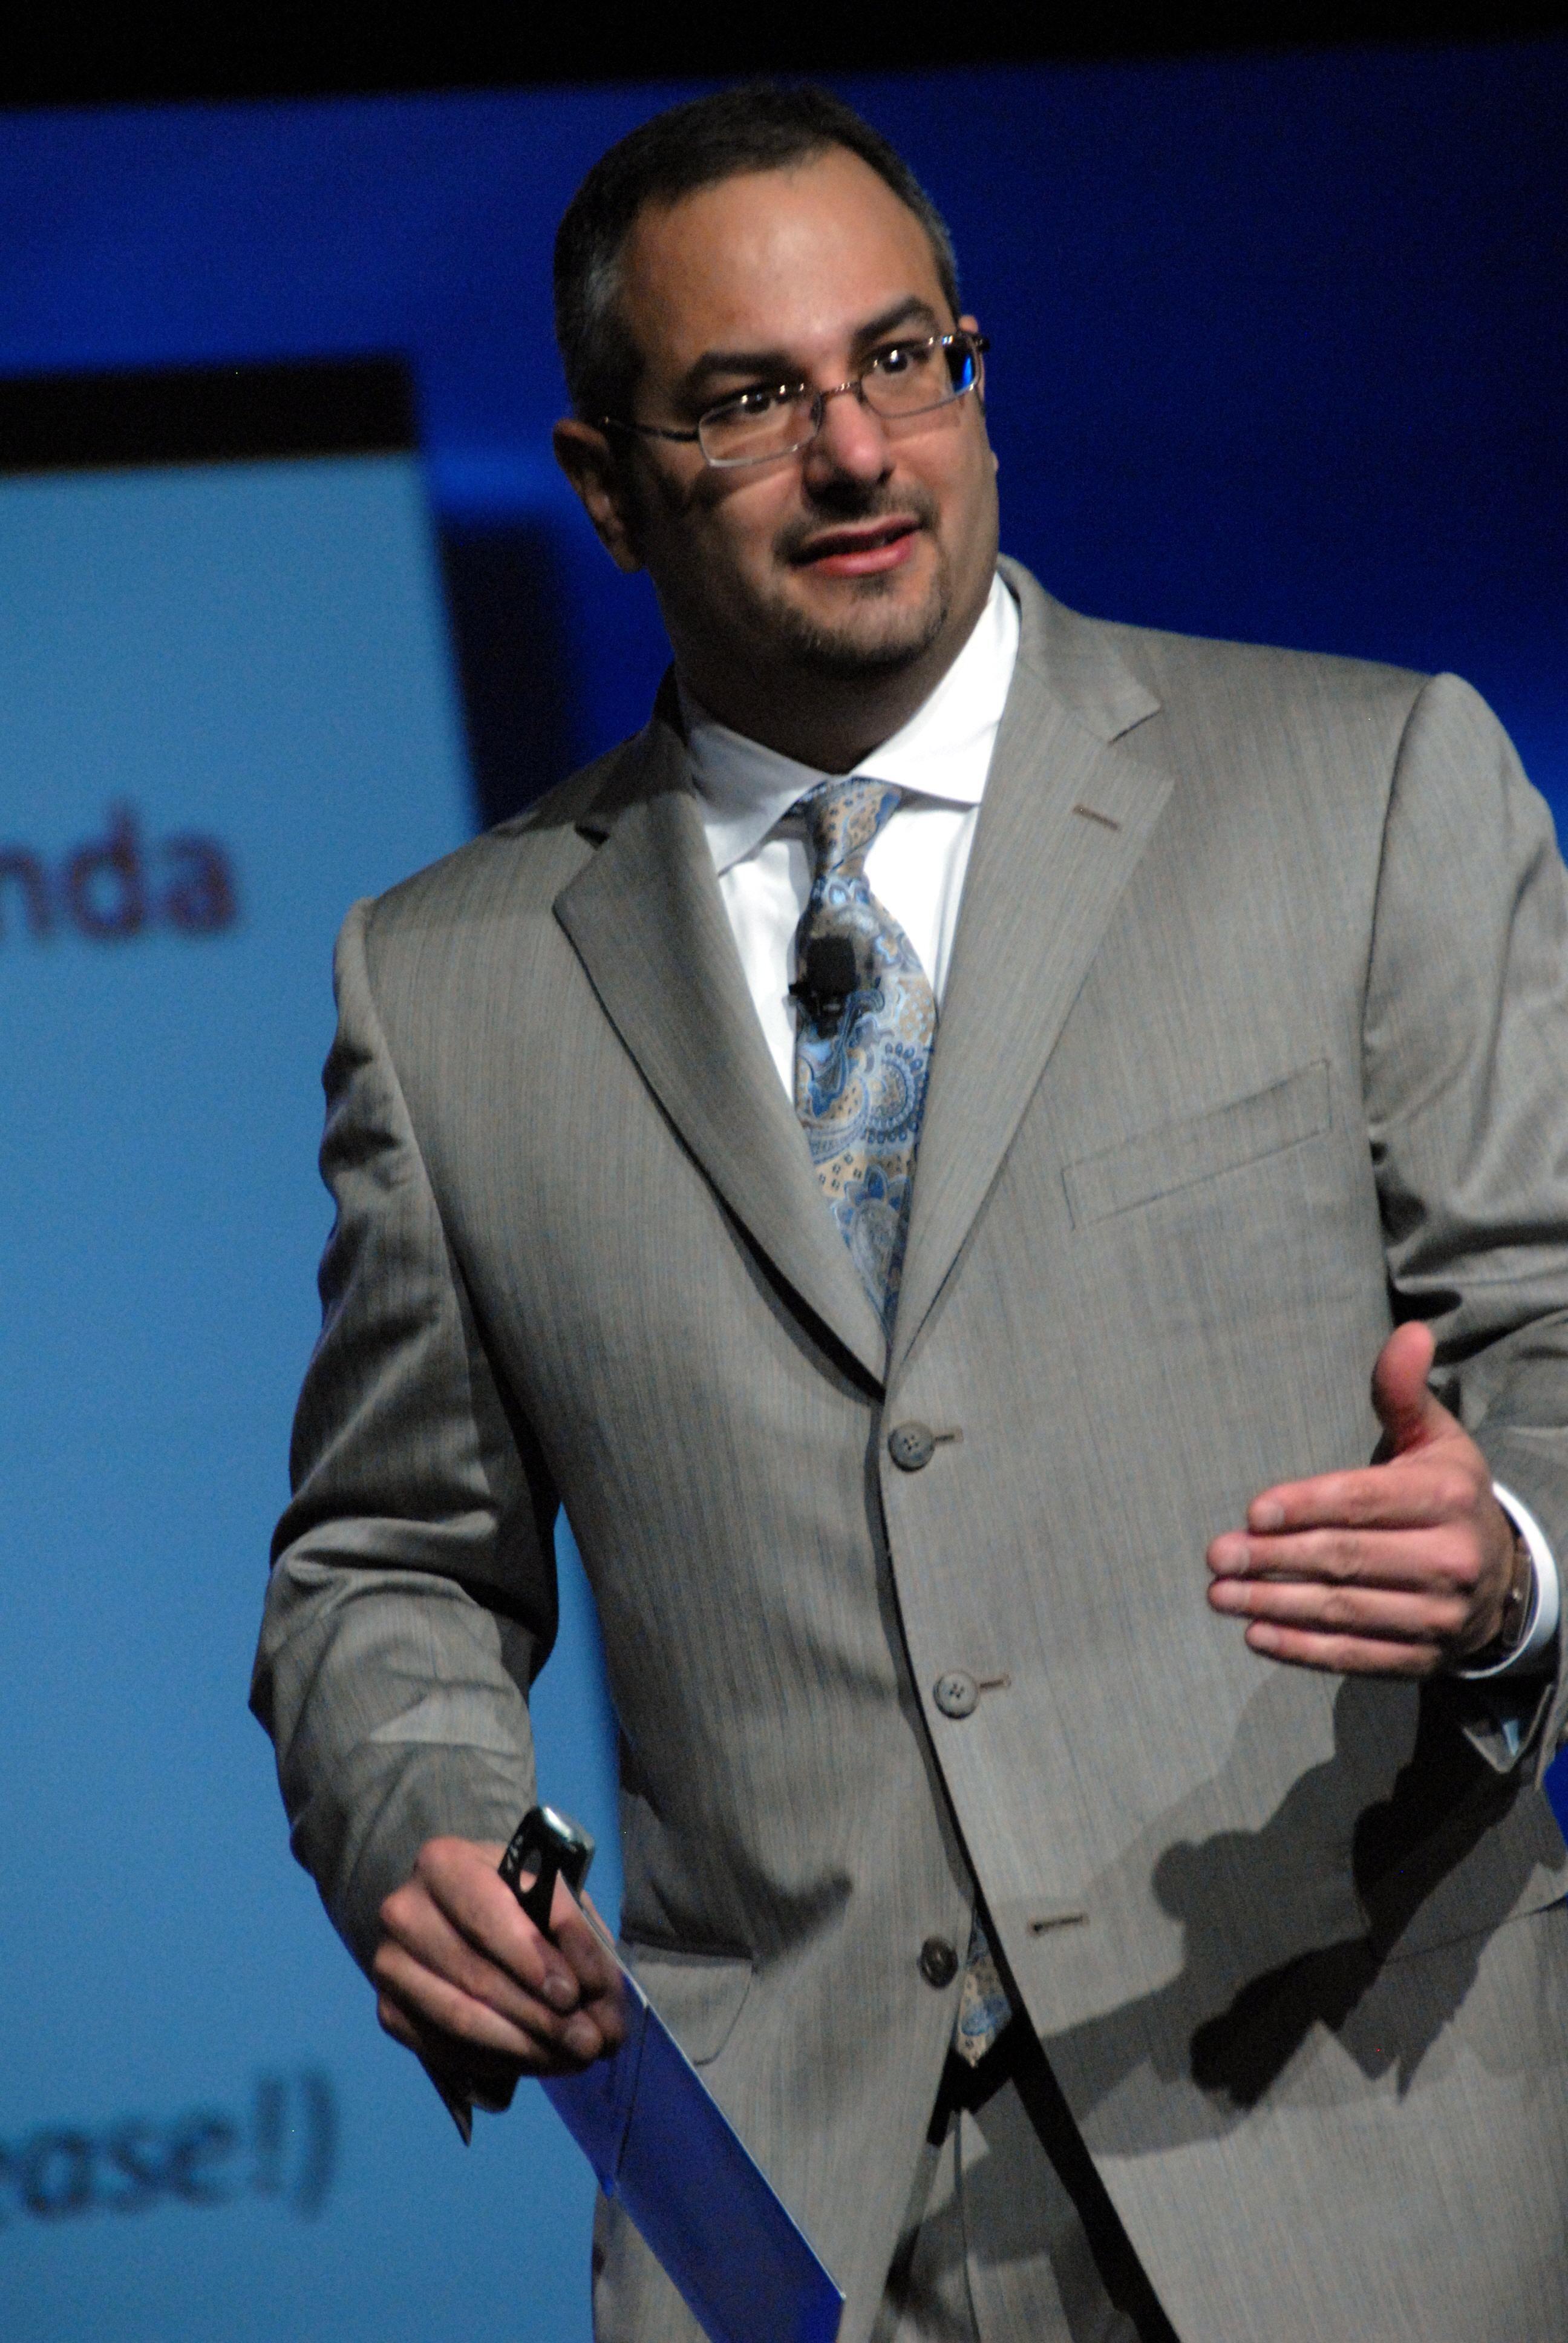 Matthew Ferrara of MF Company